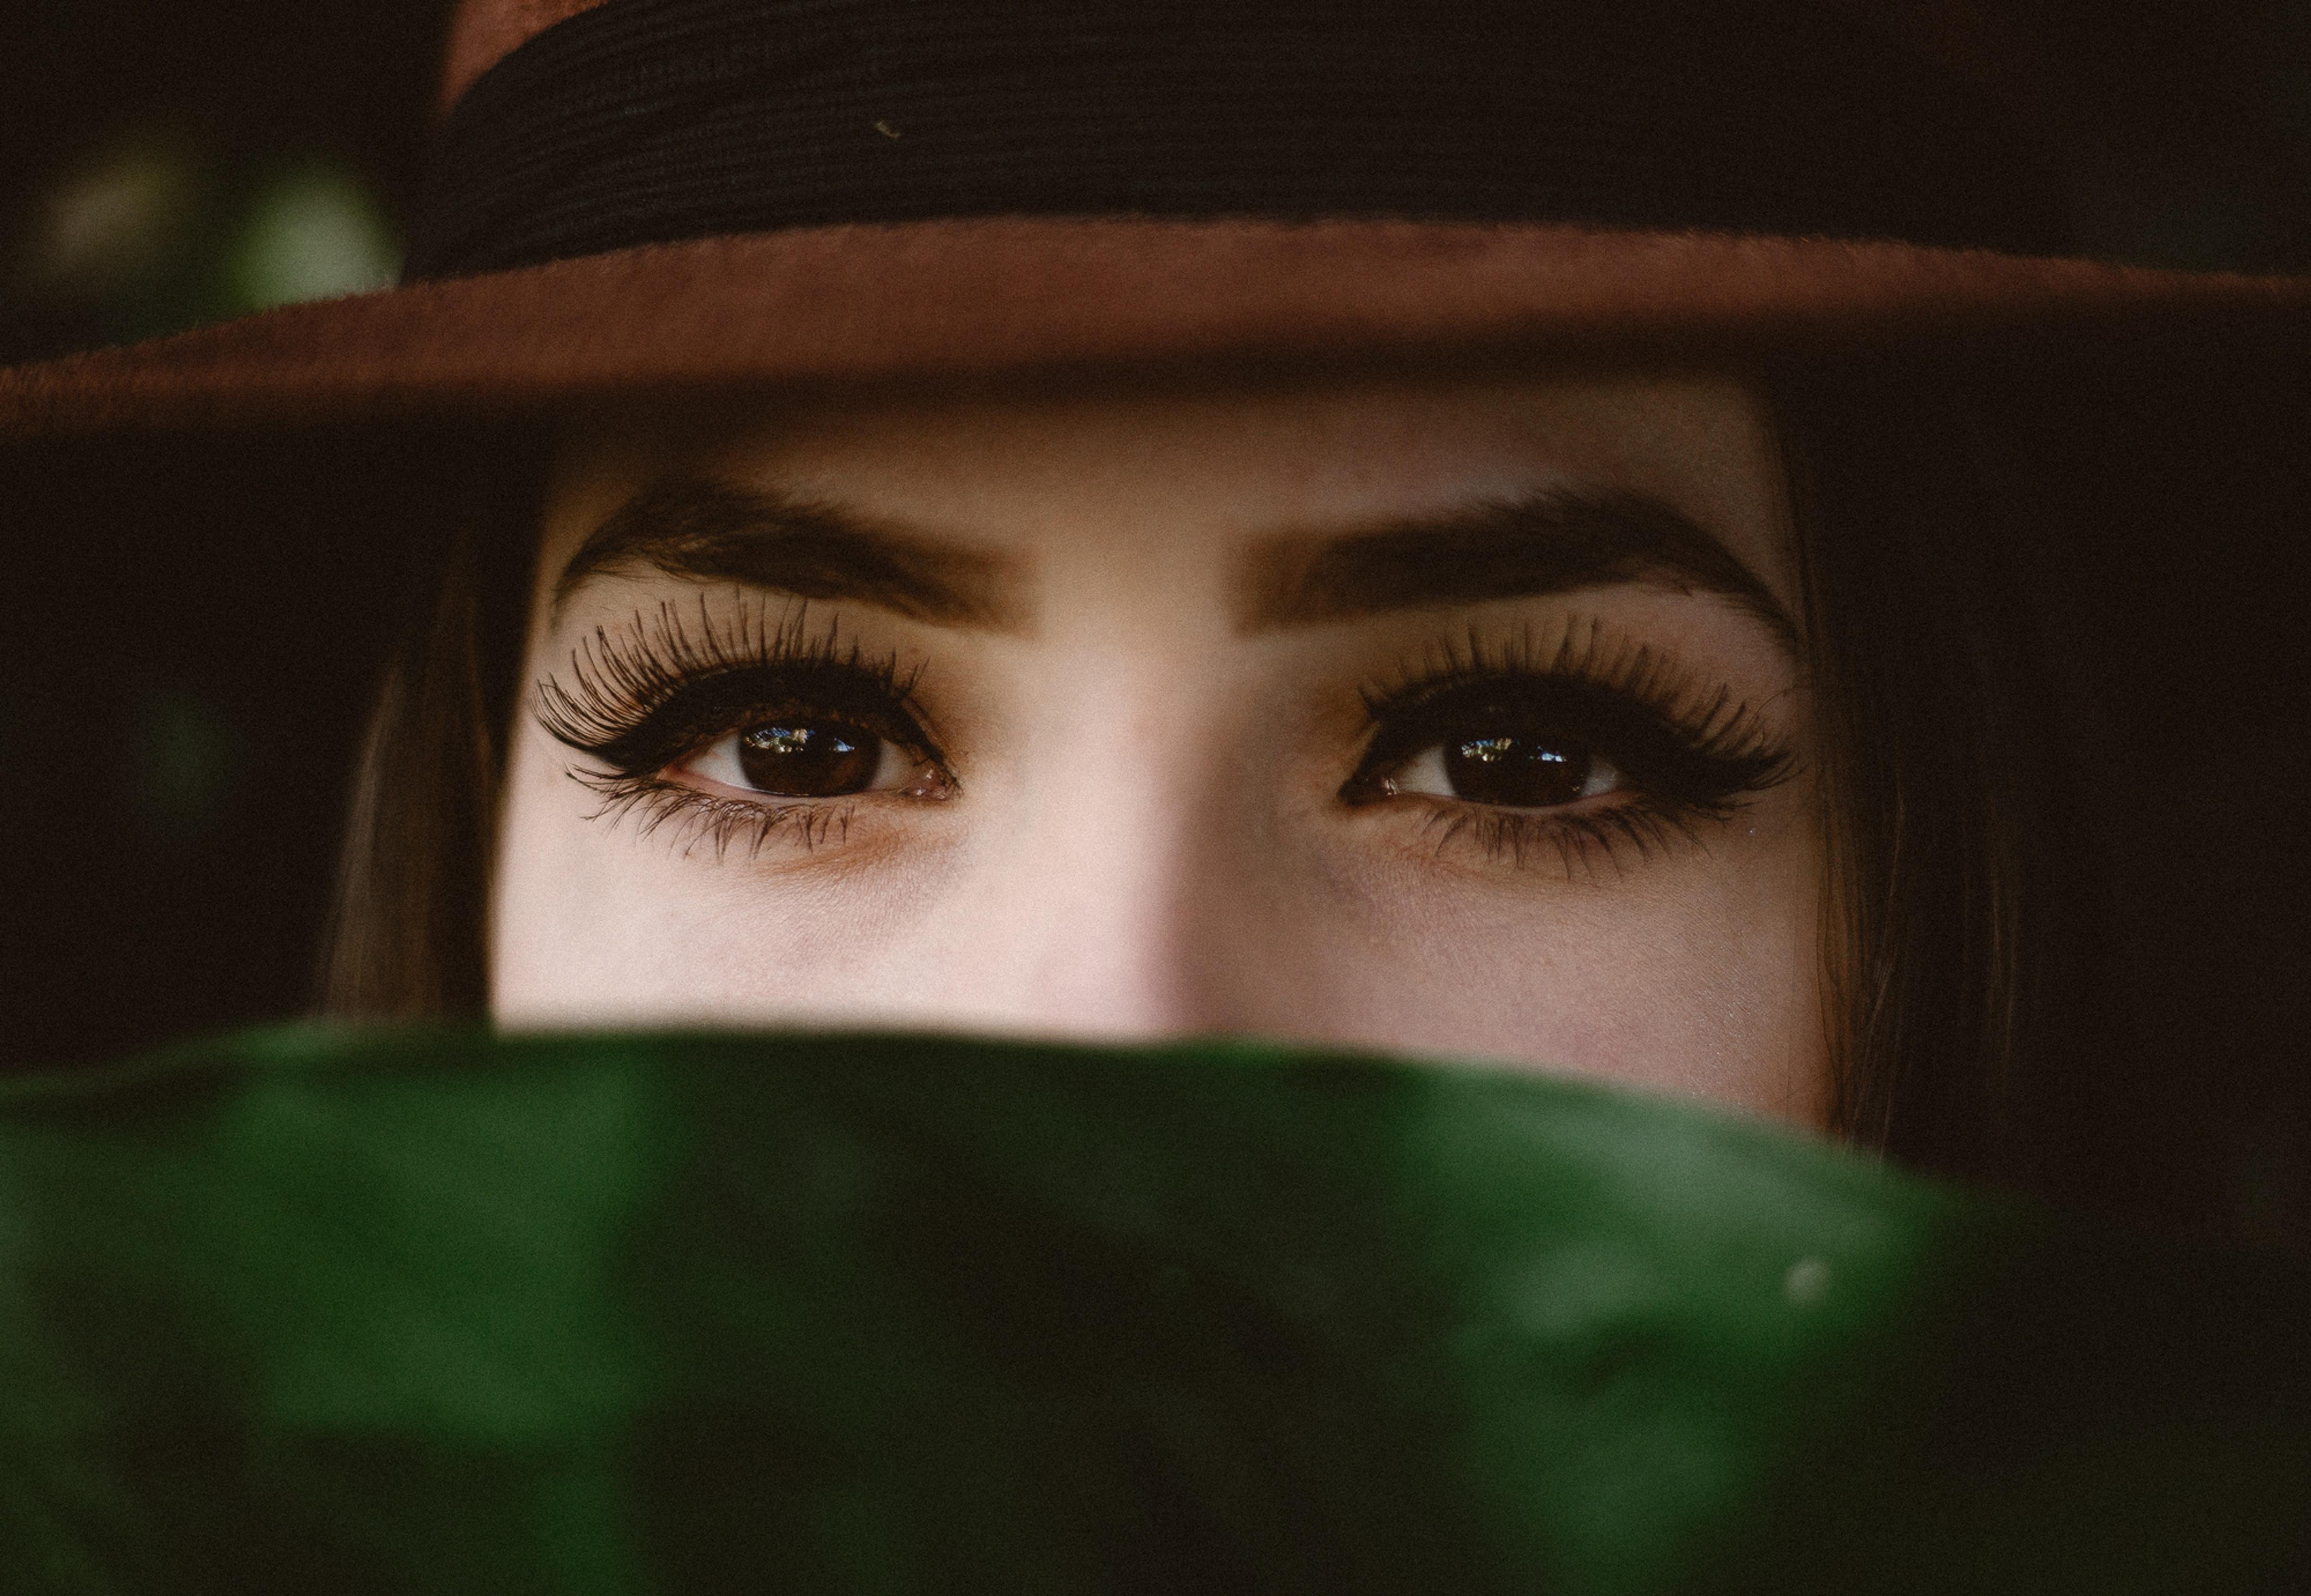 Eye Lash Extensions - Full Set